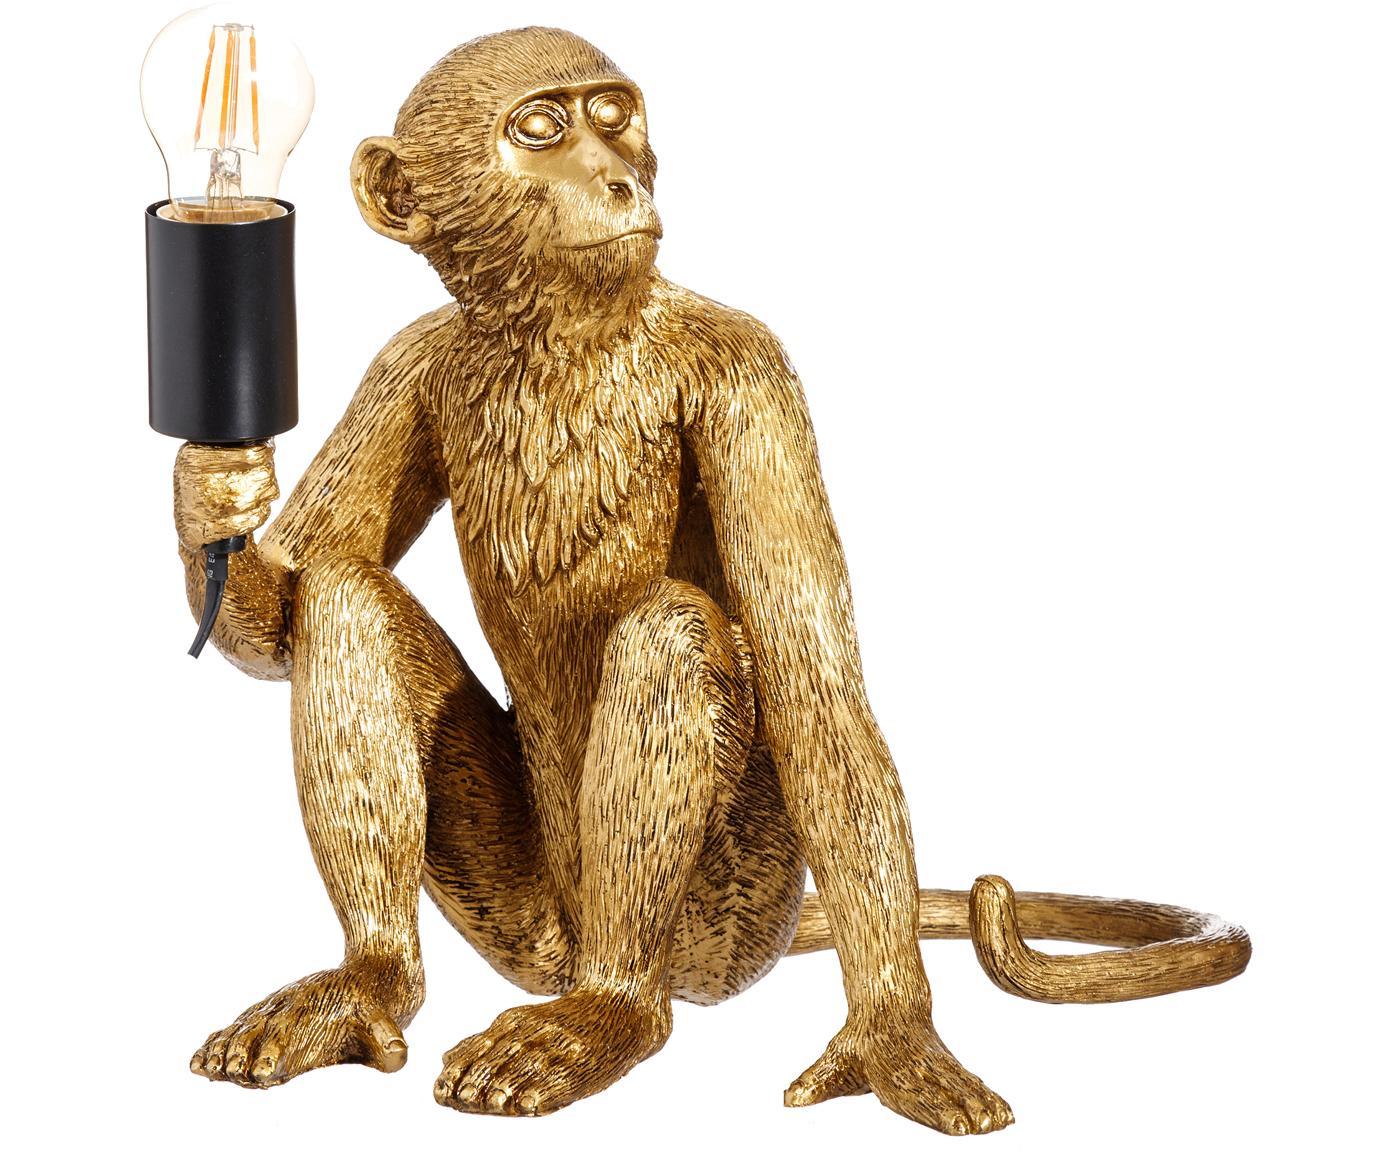 Design-Tischleuchte Monkey, Polyresin, Messingfarben, 31 x 31 cm